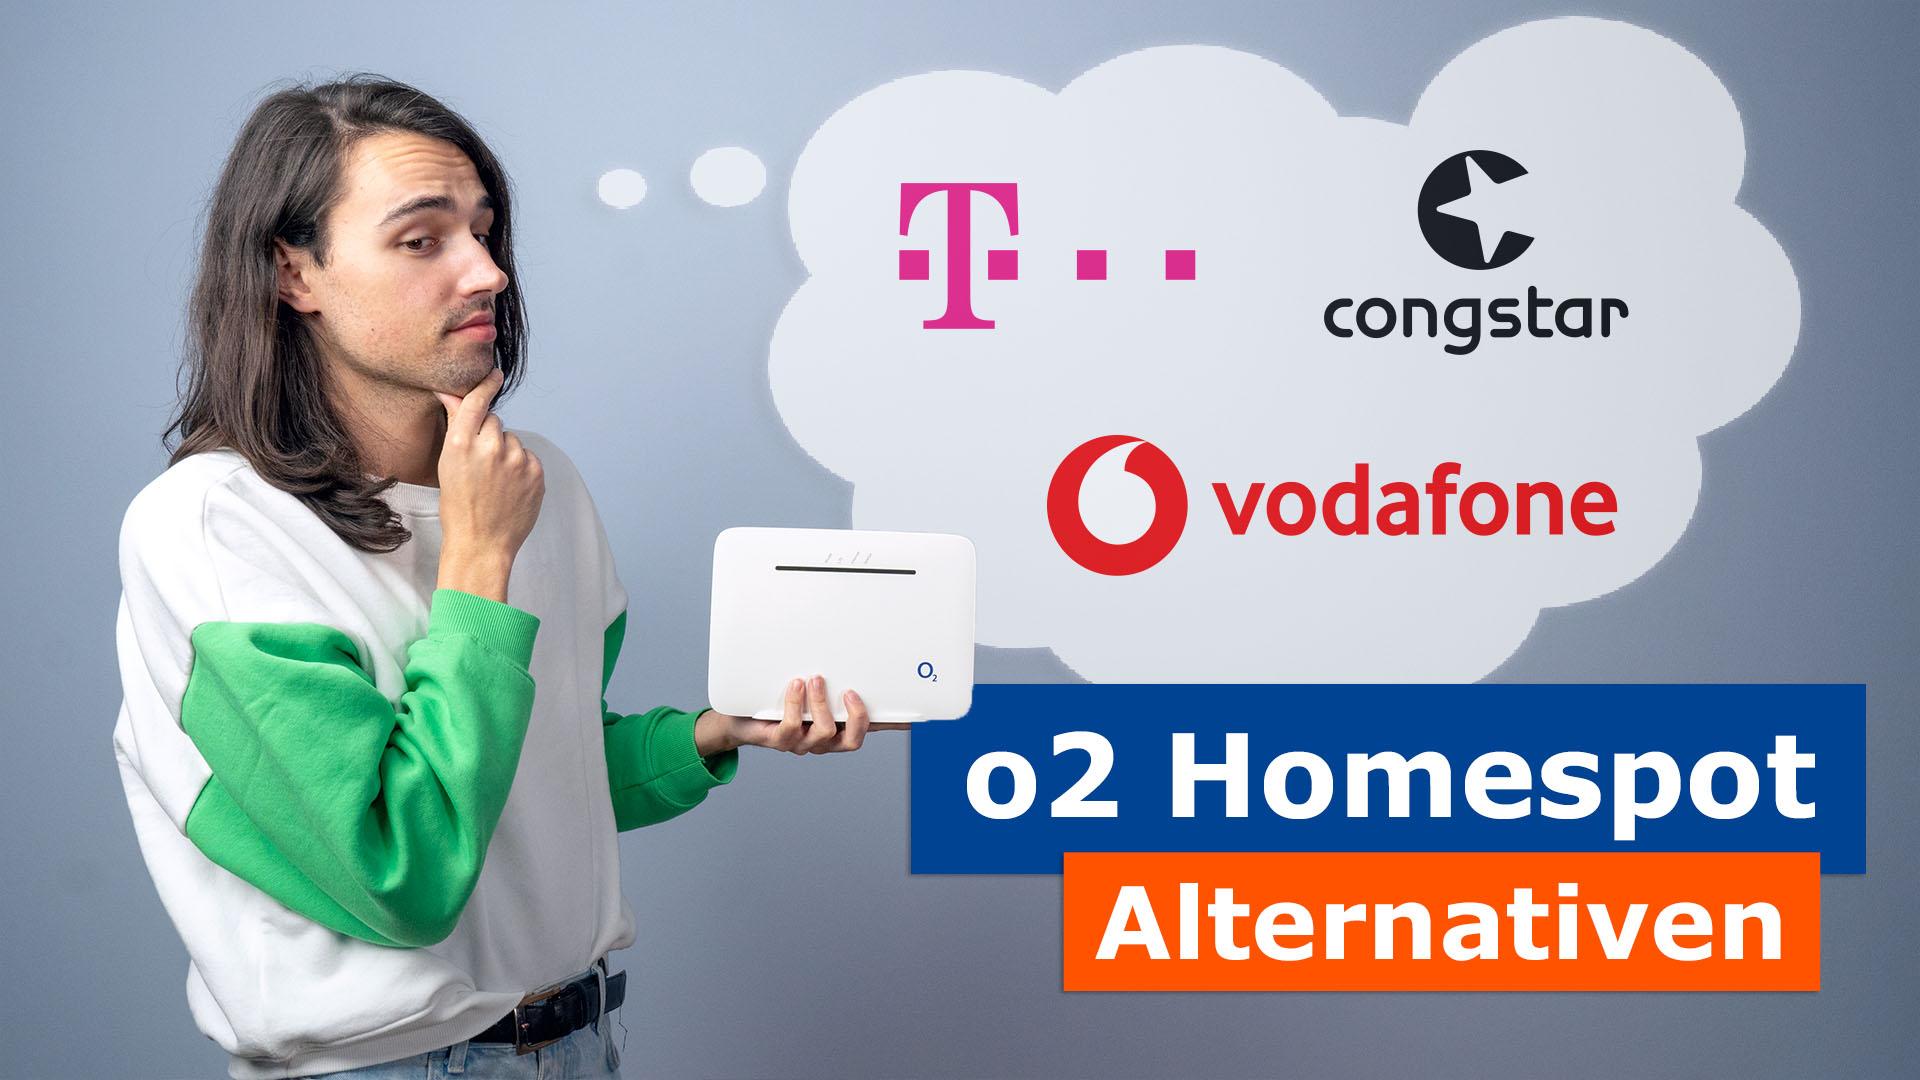 o2 Homespot Alternativen